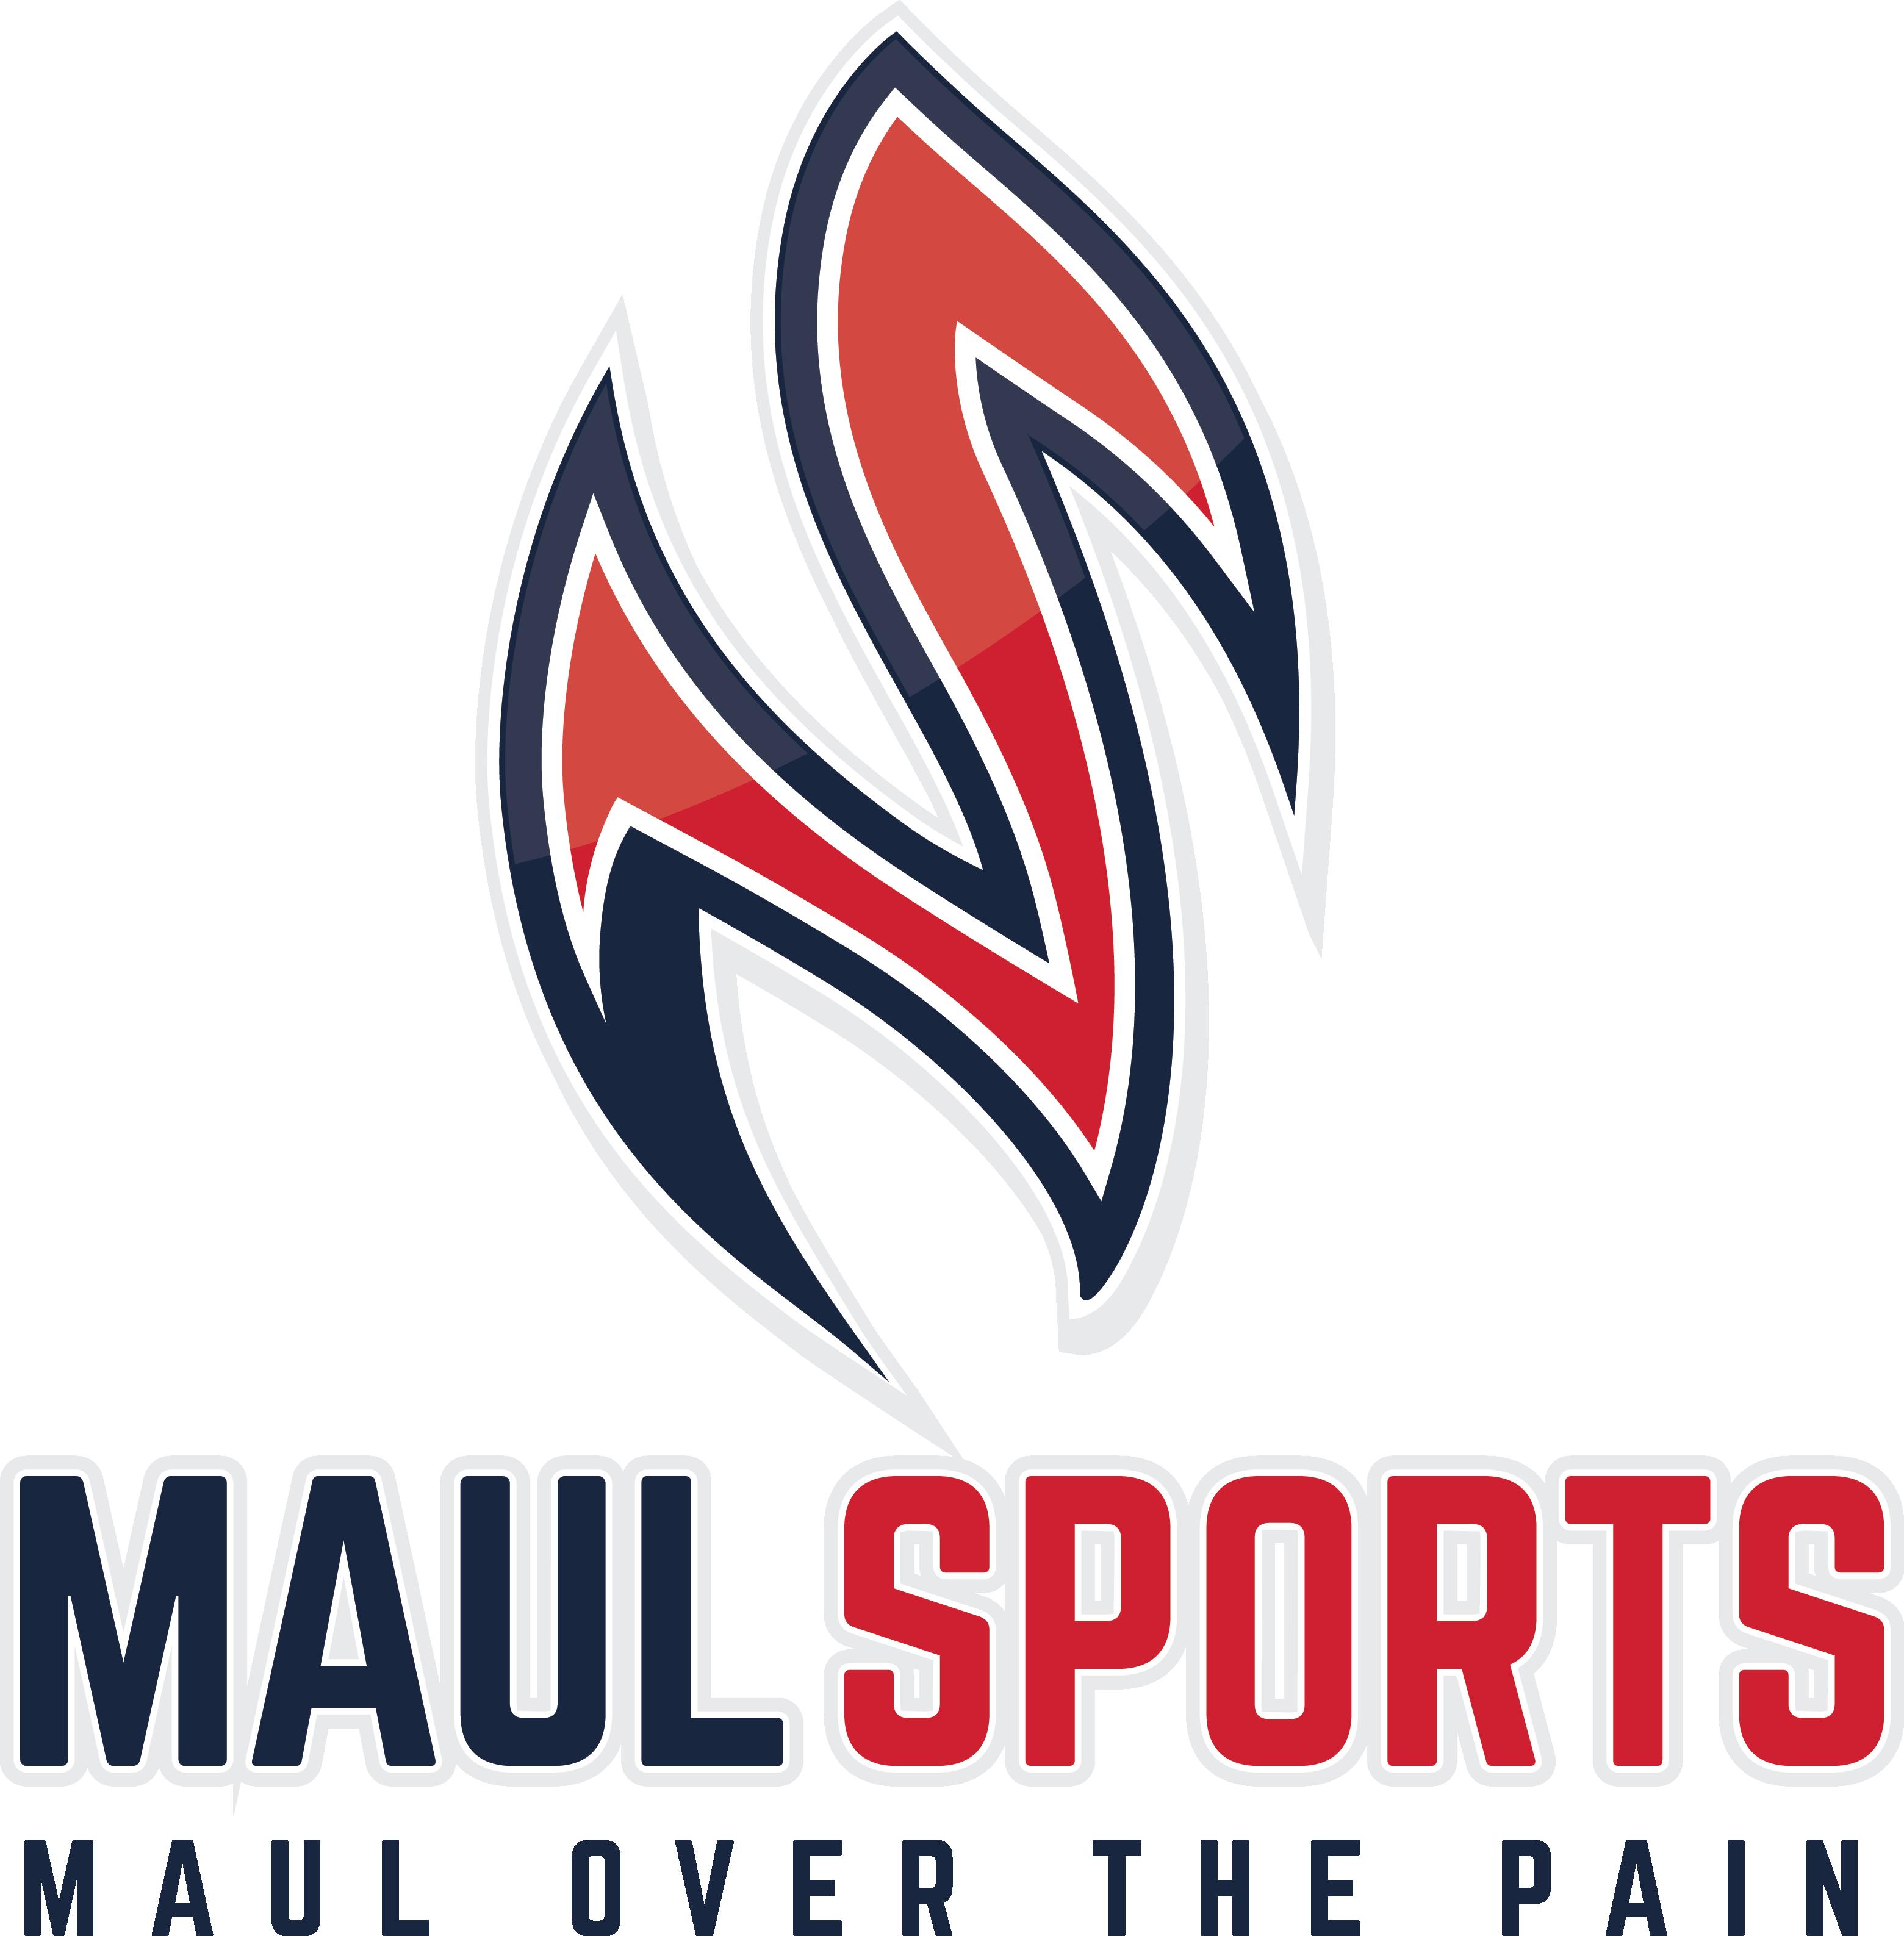 Maul Sports